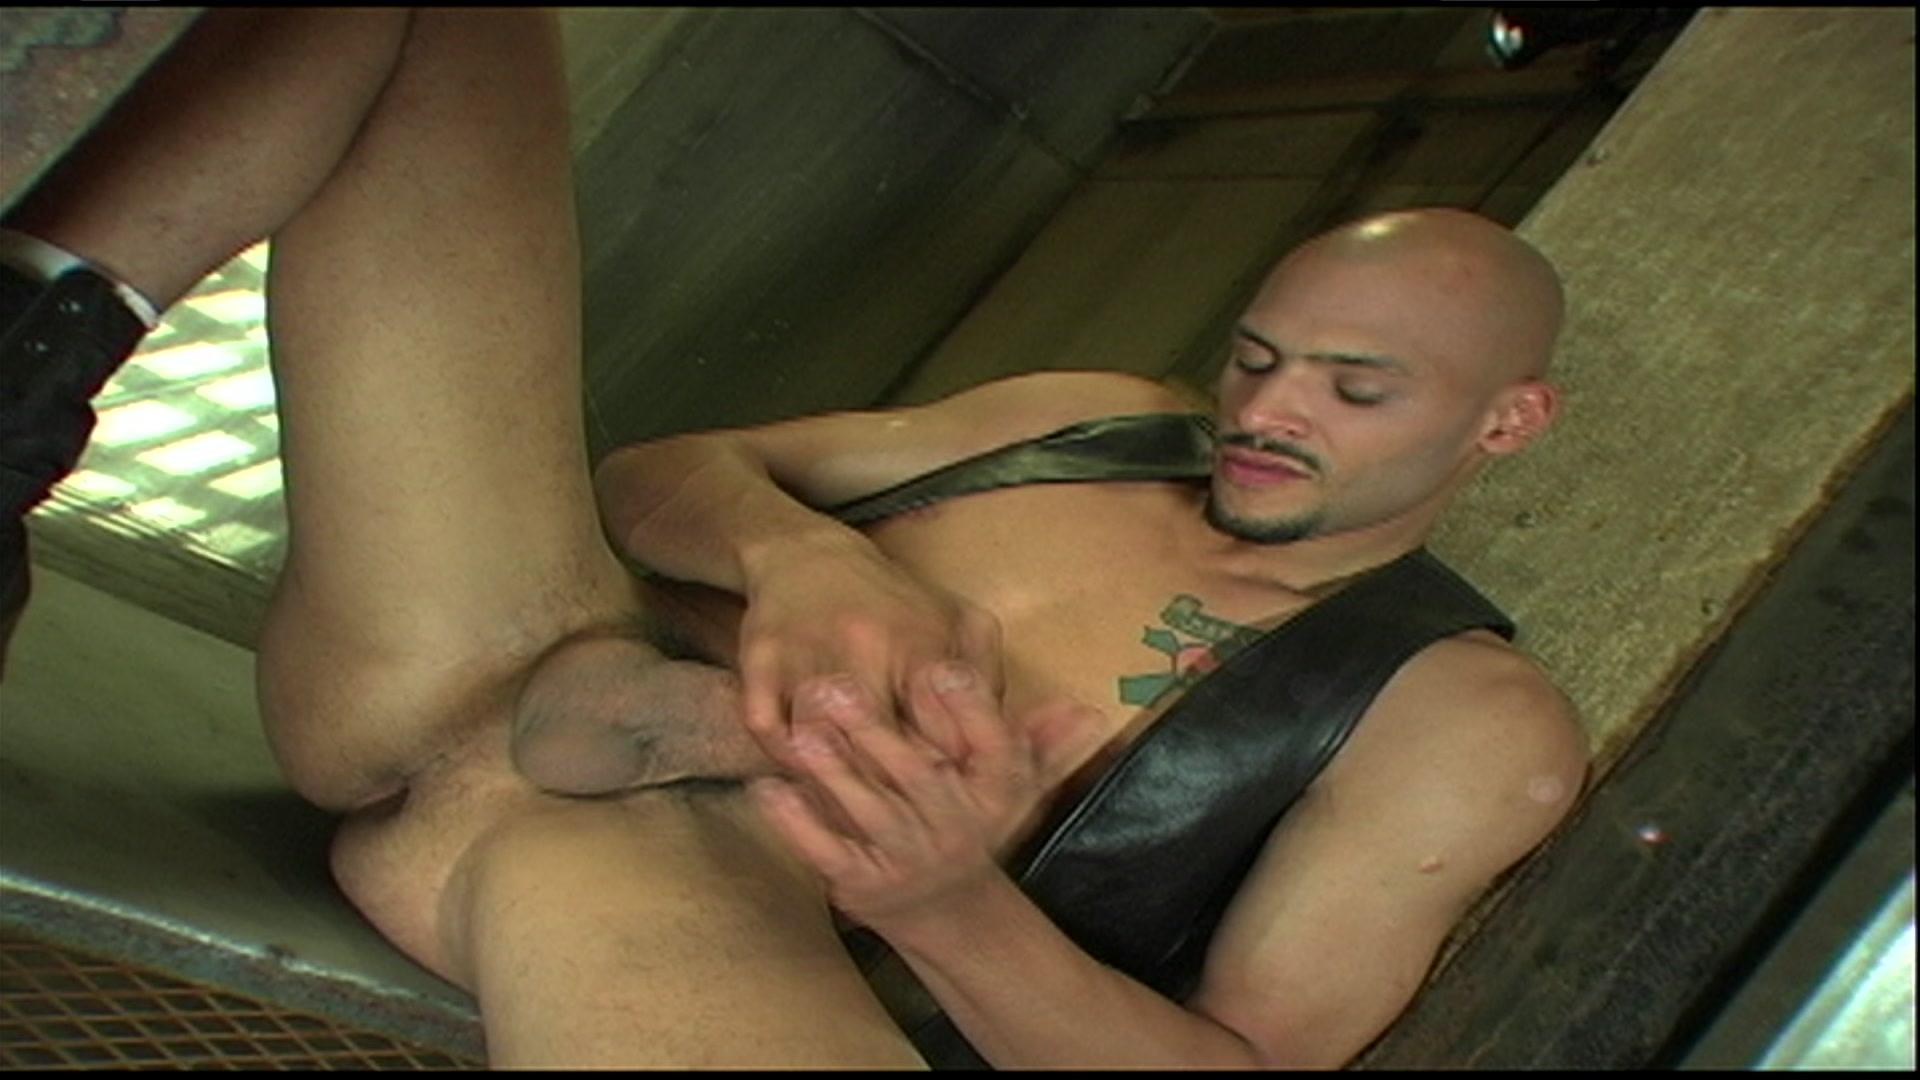 Nino Bacci Porno nino bacci gay star | www.freeepornz